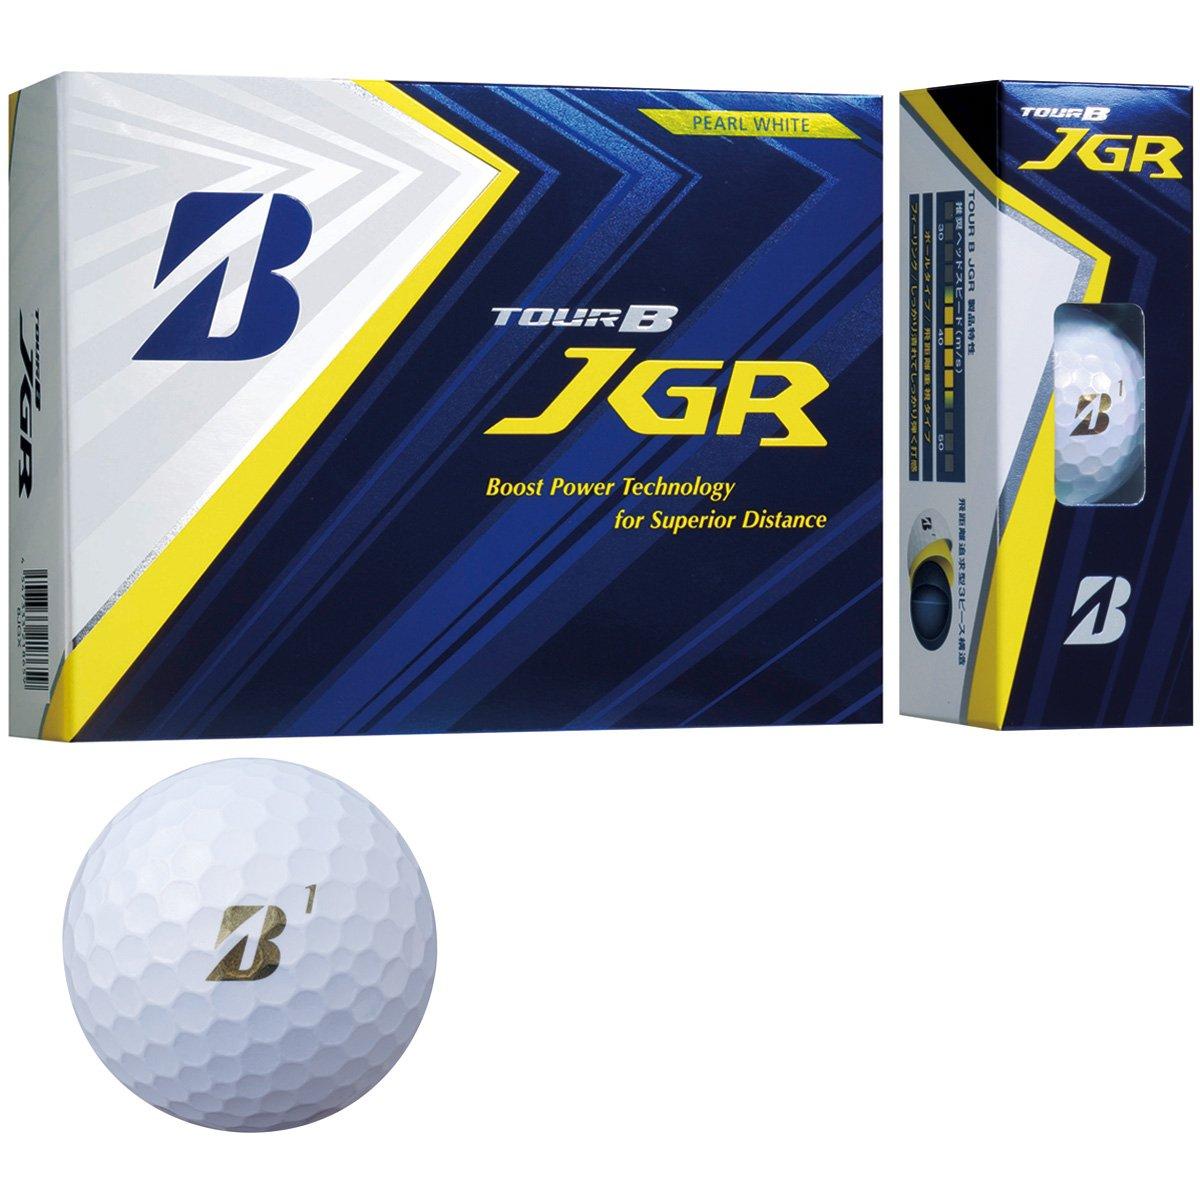 BRIDGESTONE TOUR B JGR PEARL WHITE 8JGX ブリヂストン ツアービー ジェイジーアール パールホワイト 2ダースパック 24球 ボール ゴルフ 送料無料 平成最後 令和 新生活